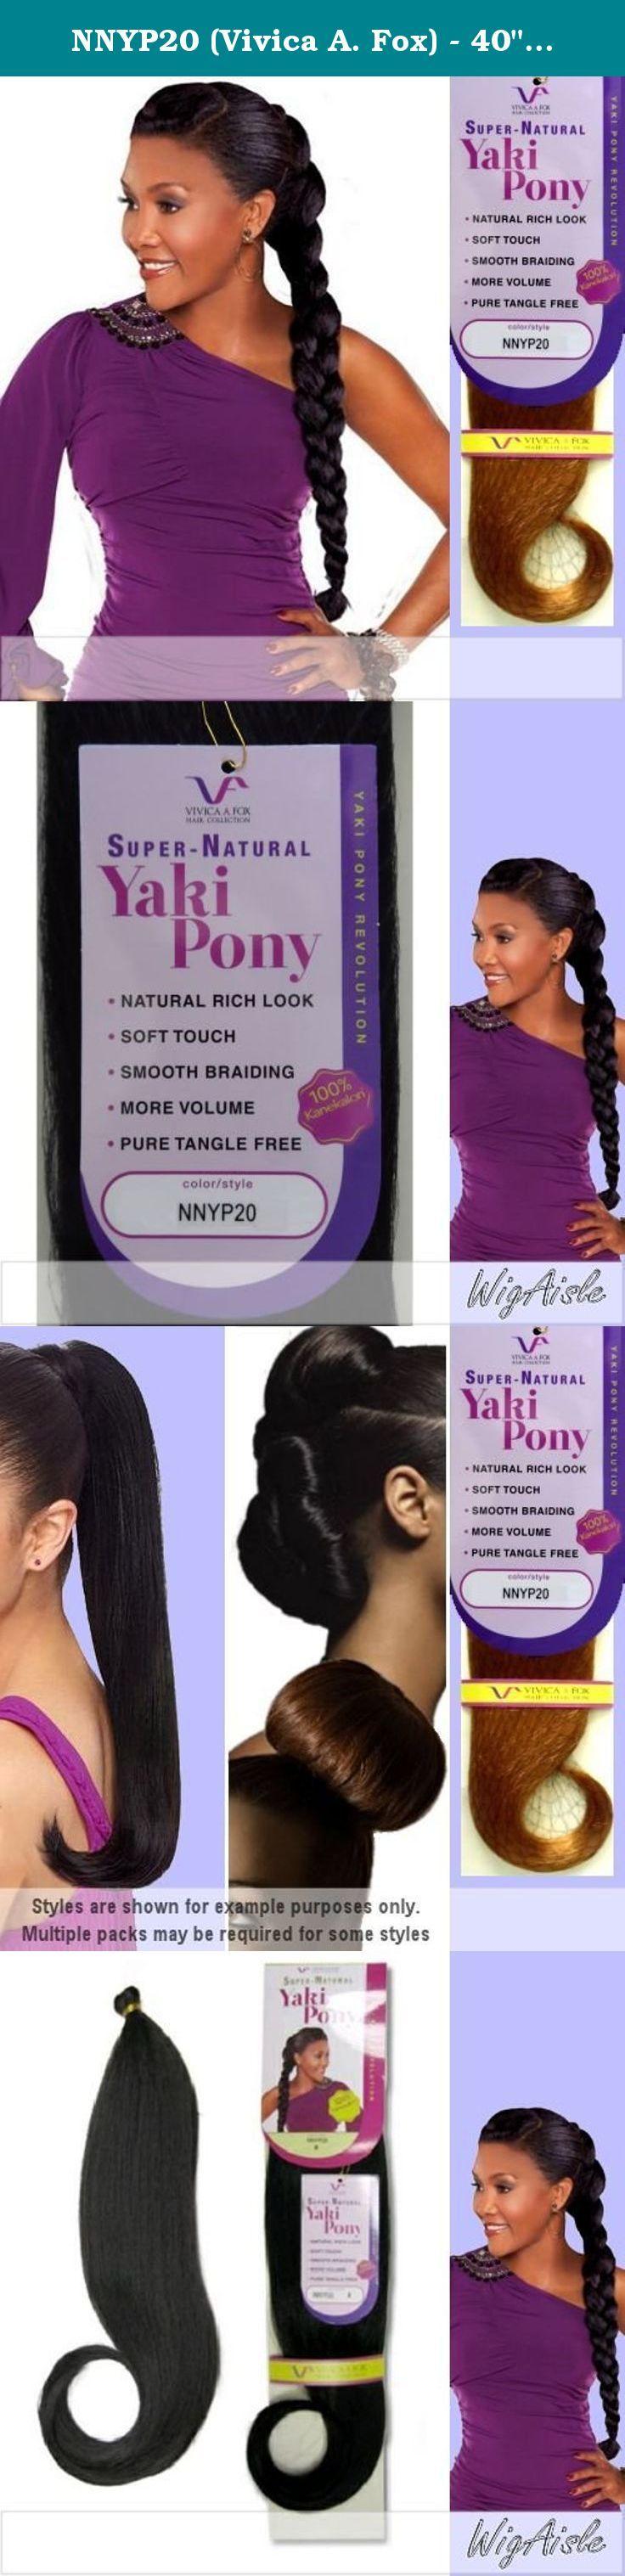 "NNYP20 (Vivica A. Fox) - 40"" Kanekalon Pony Braiding Hair in JET BLACK. 40"" SUPER NATURAL YAKI TEXTURE PONY / BRAID HAIR. 20"" folded (Color shown is 1B) - Color 1 is JET BLACK."